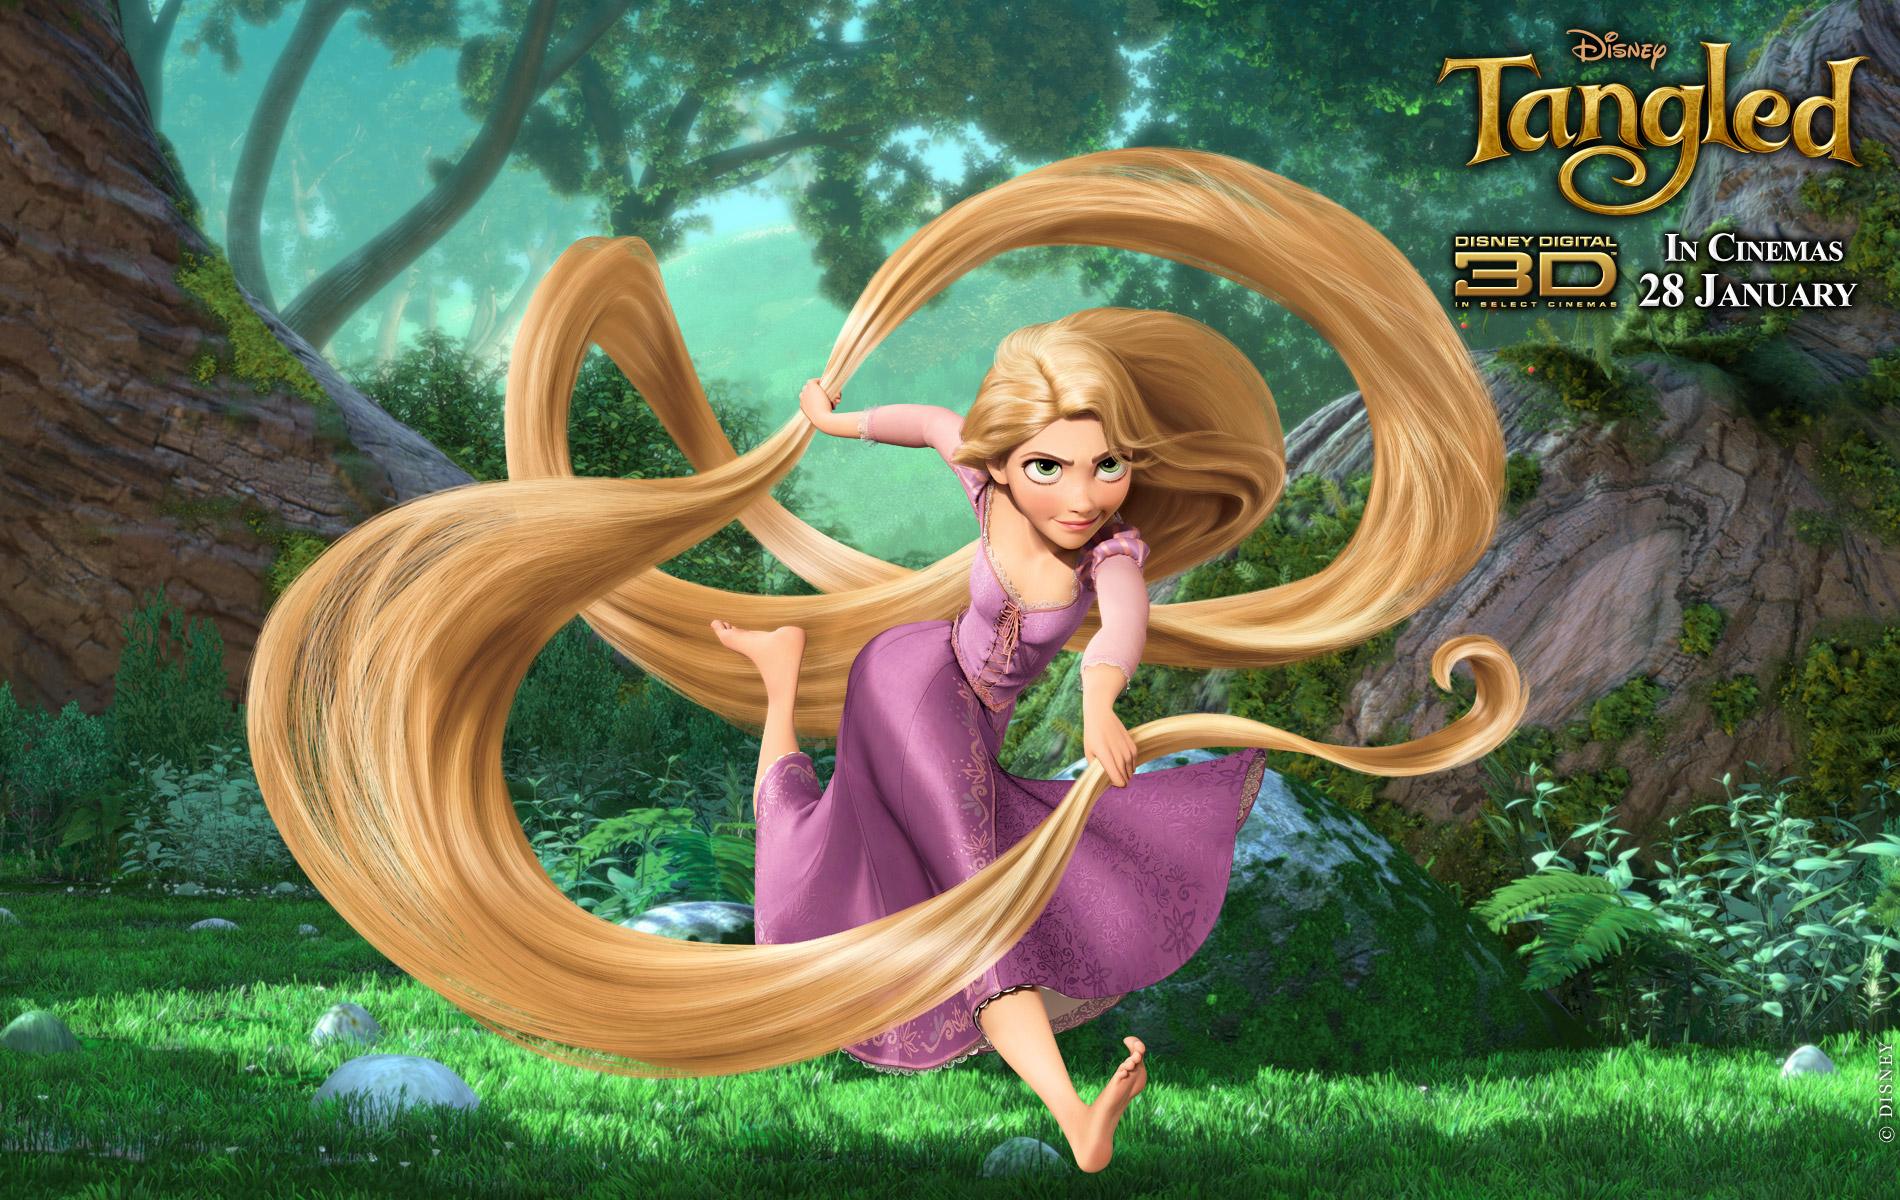 rapunzel Disney Tangled Wallpaper 1900x1200